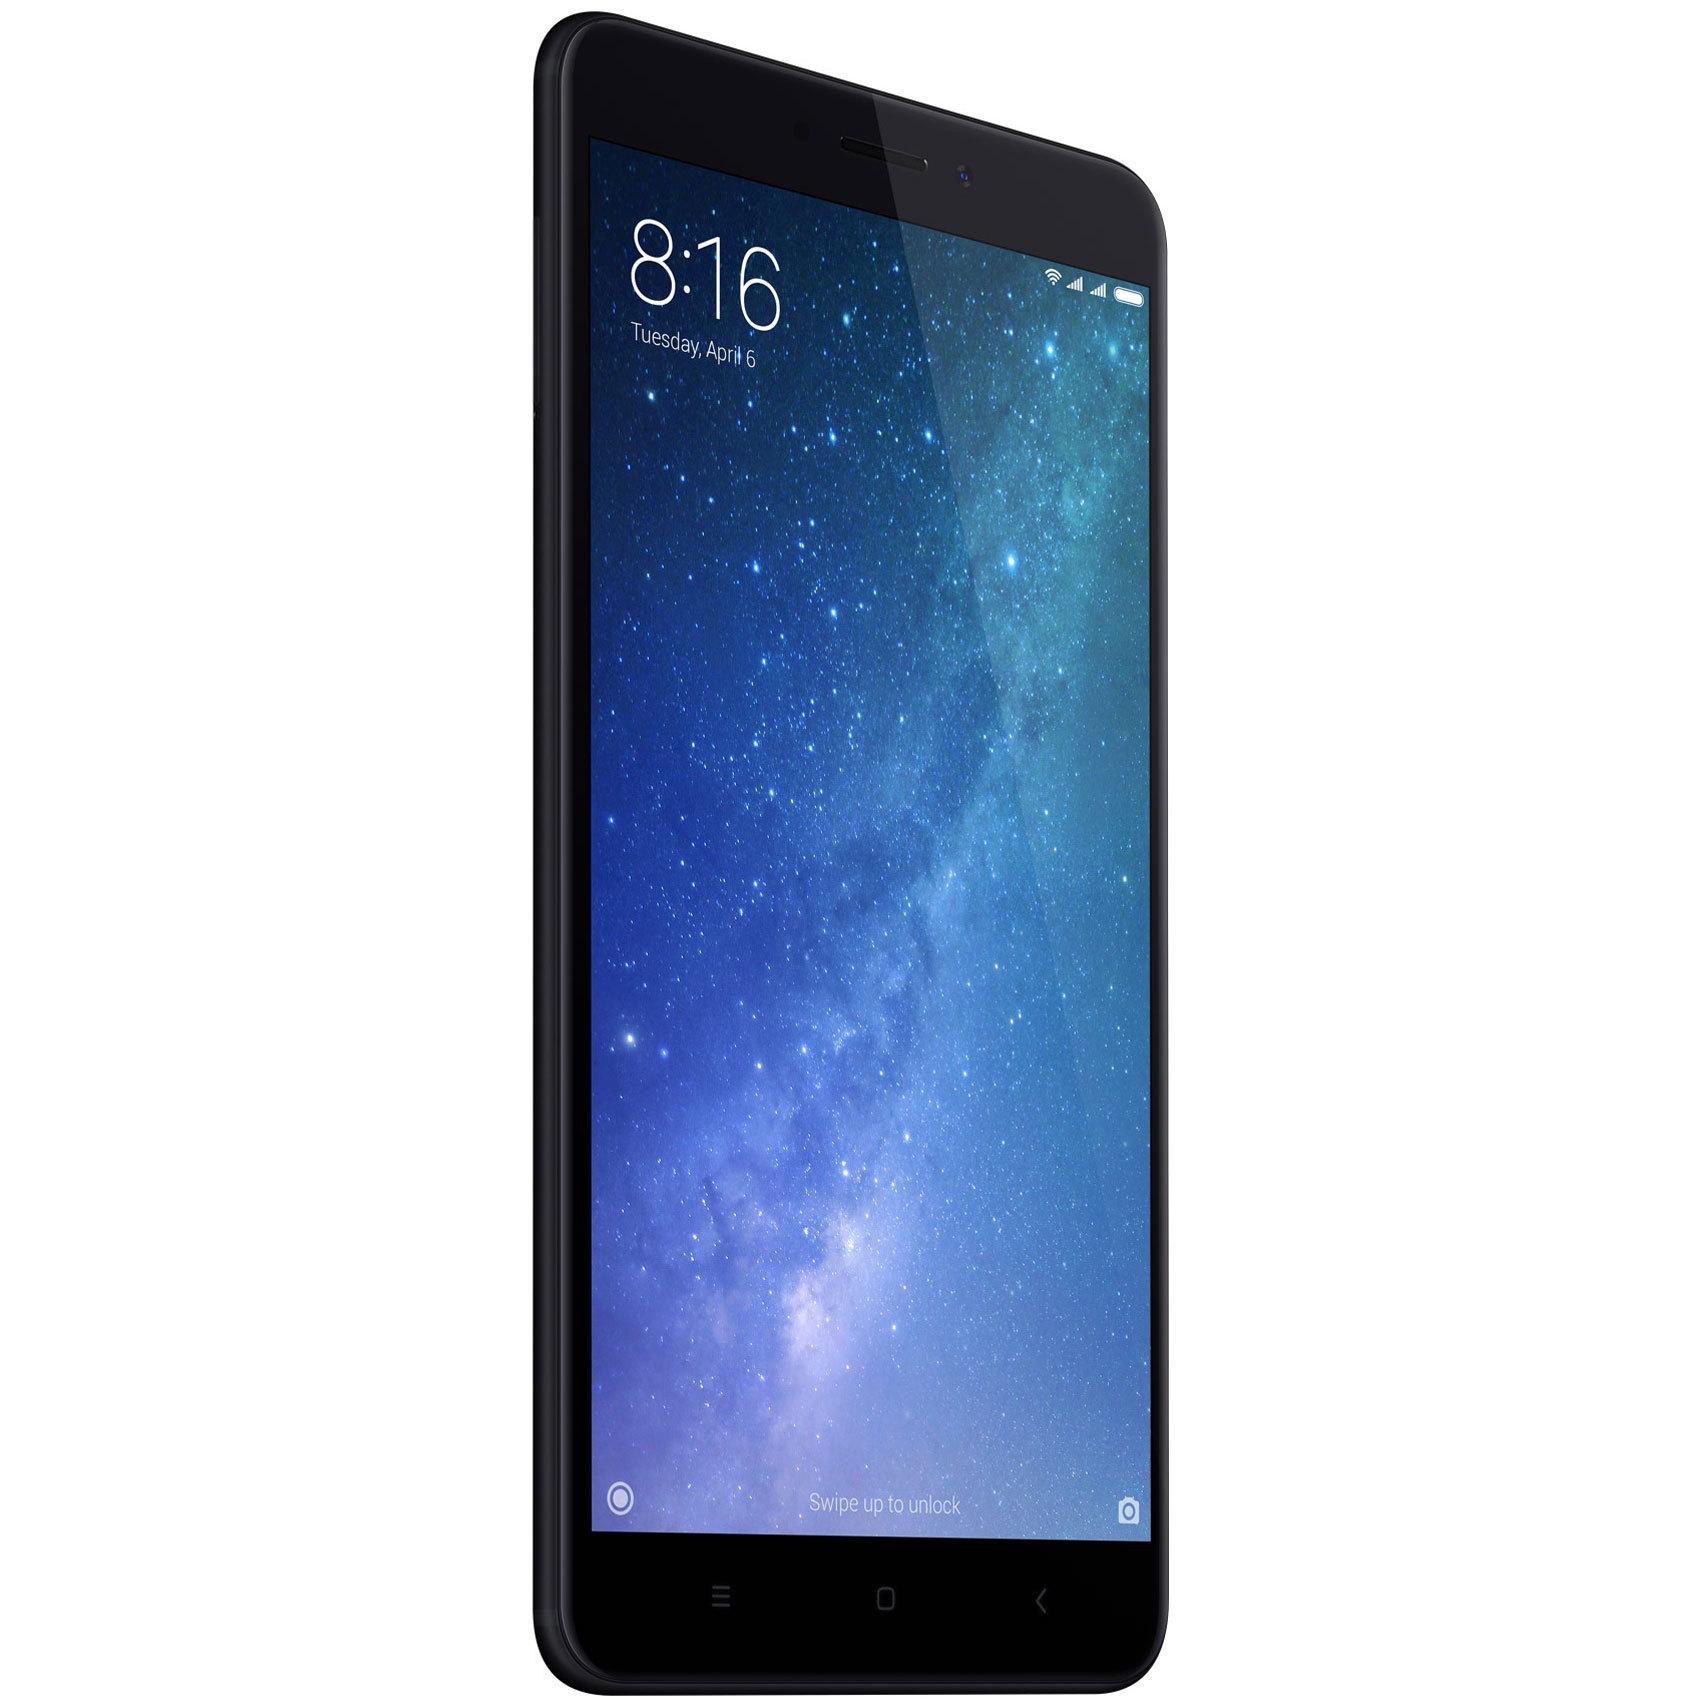 Buy Xiaomi Smartphone Mi Max 2 64gb Dual Sim 4g Black Online In Uae Redmi Note 4 Ram 4gb Distributor 64 Lte Ds